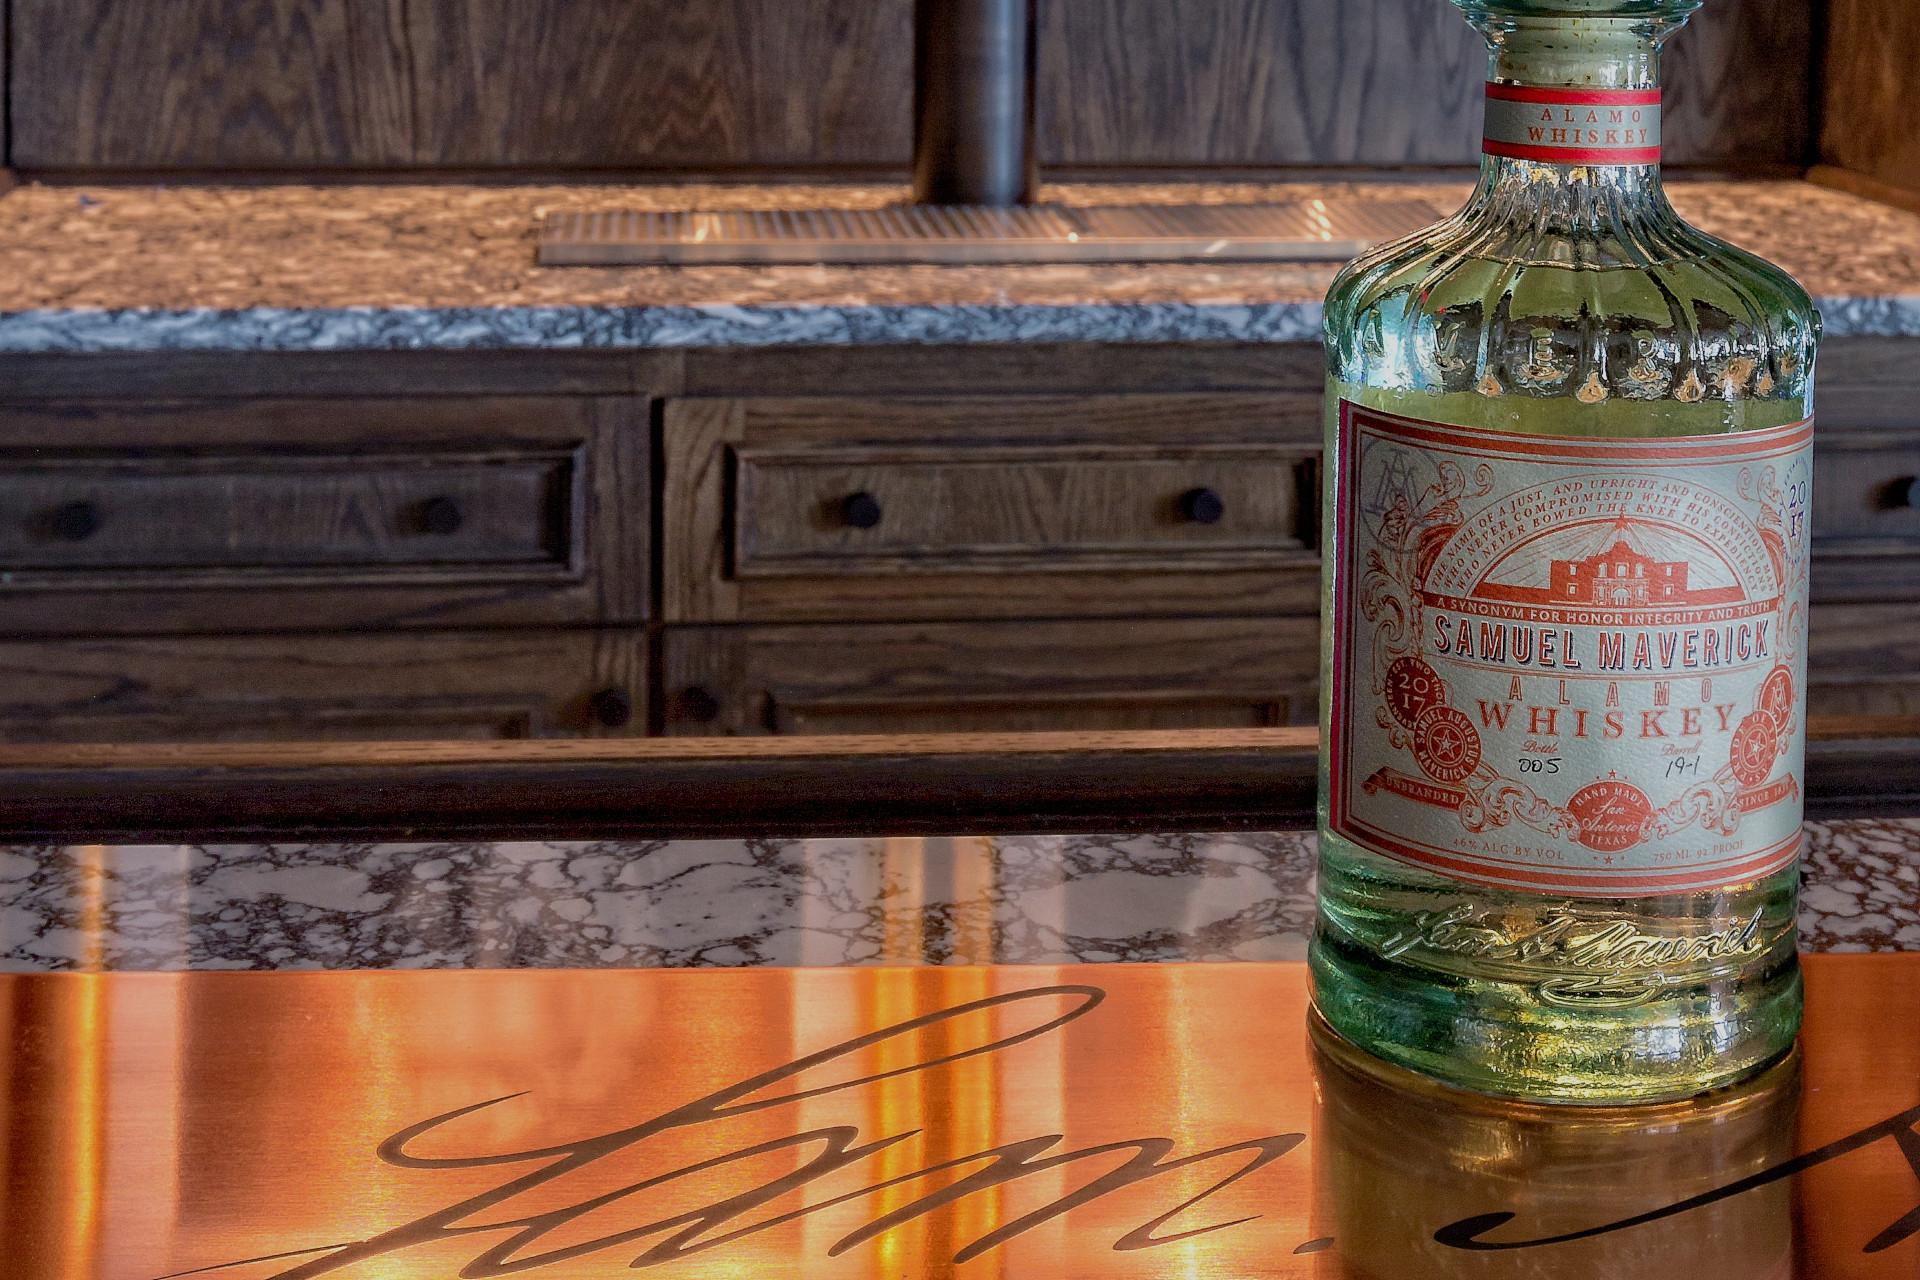 Maverick Whiskey San Antonio Whiskey Distillery